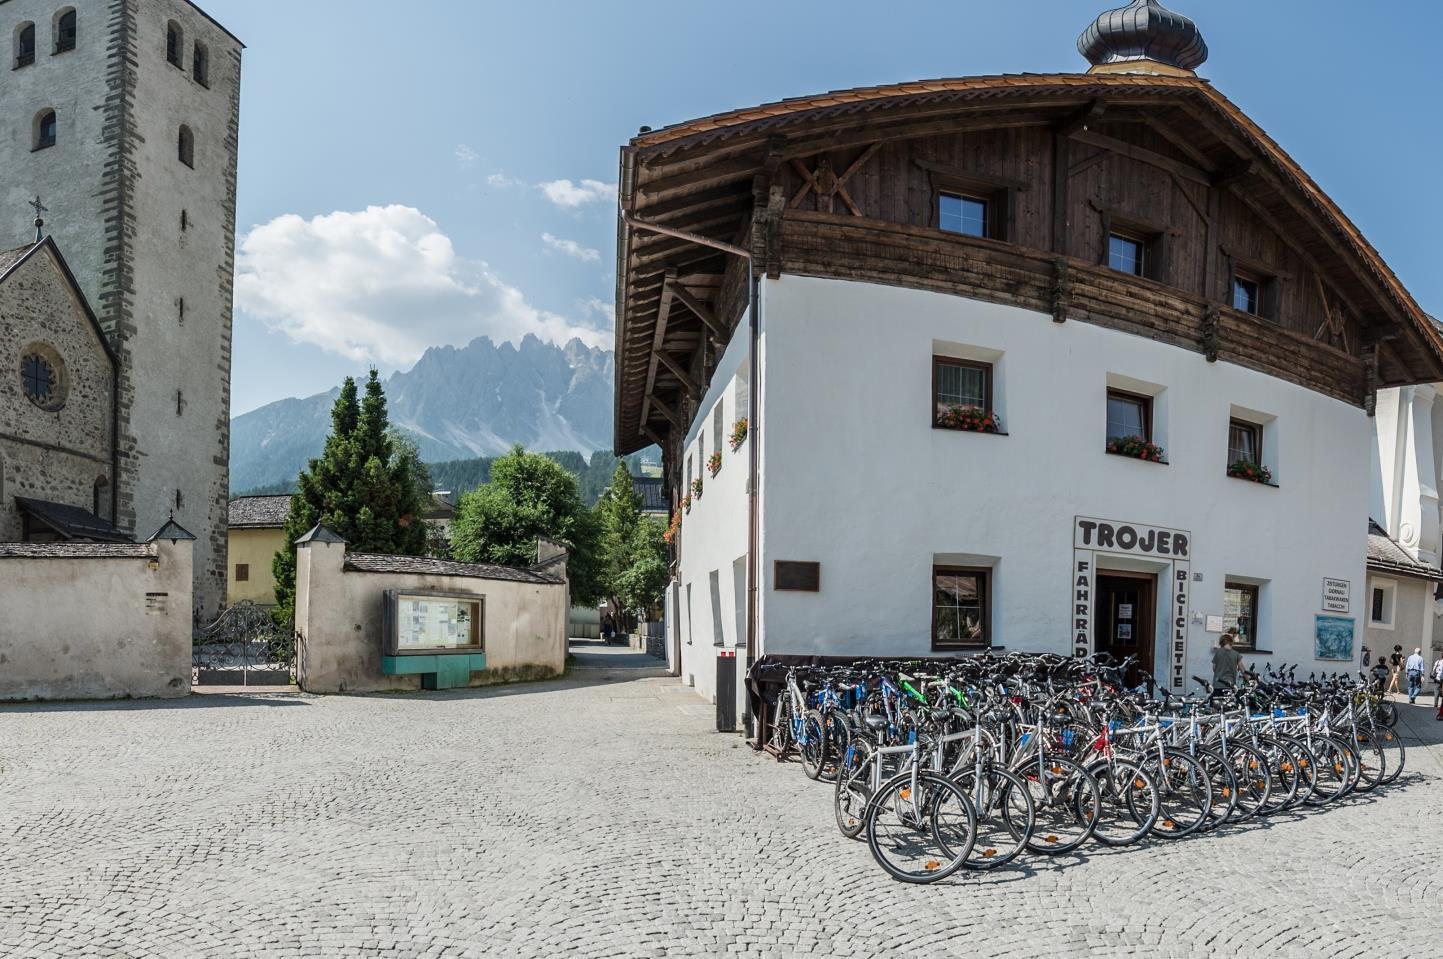 Bike rental Trojer Martin San Candido Innichen